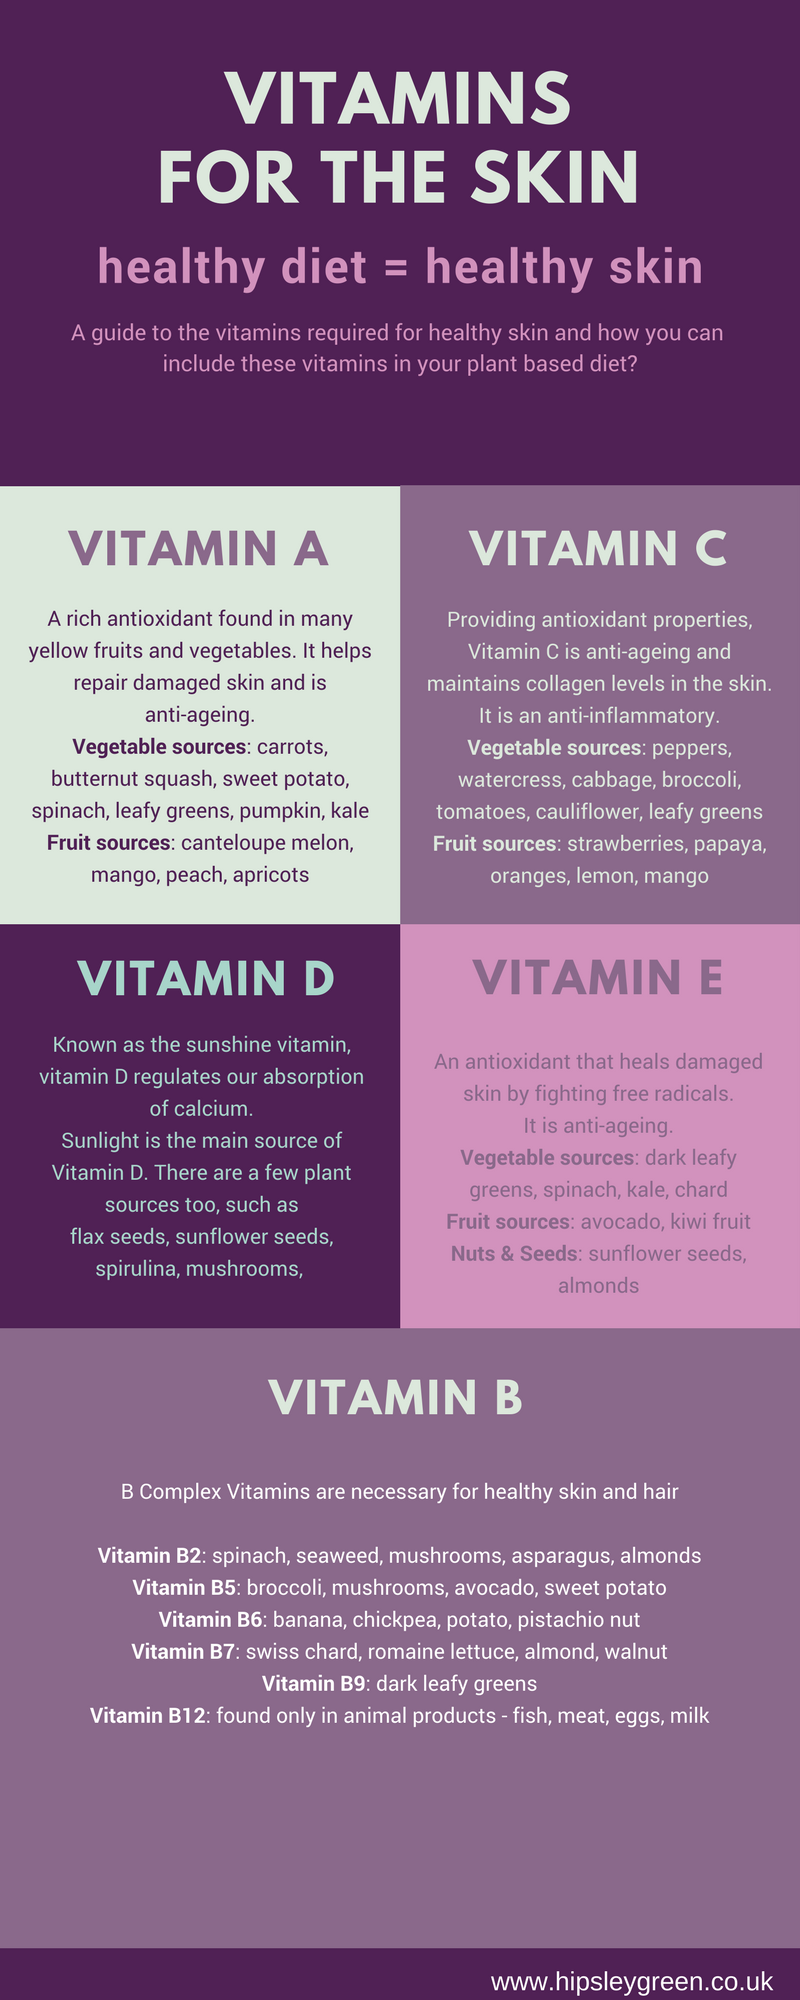 Beauty News Skin Care 2018 beauty news skin care, vitamins for healthy skin, , healthy skin, skincare, natural skincare